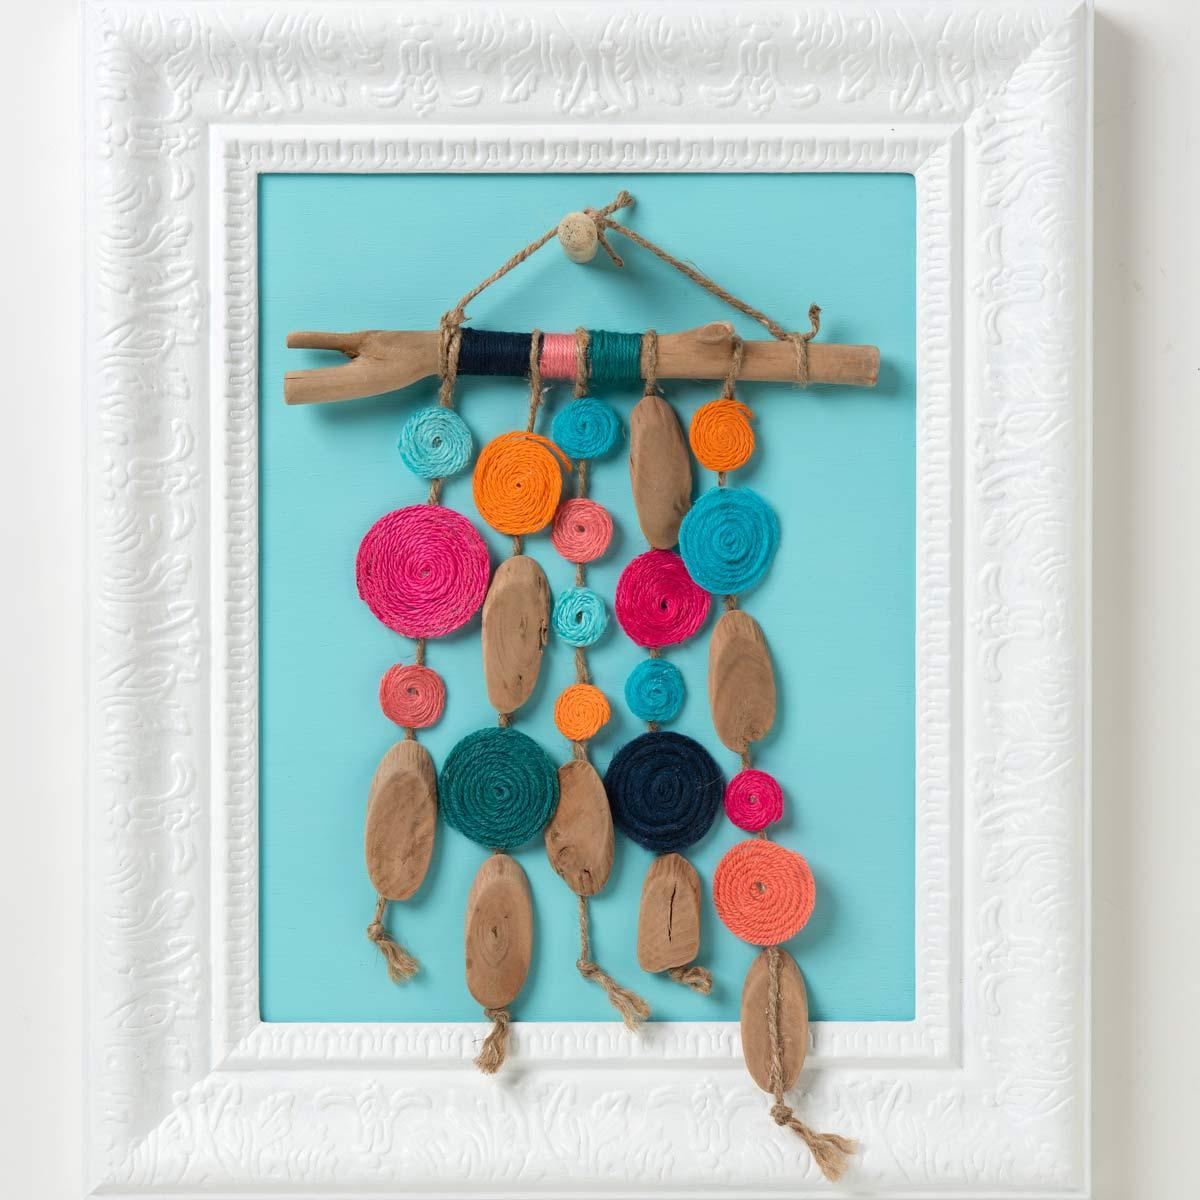 Yarn Wall-Hanging